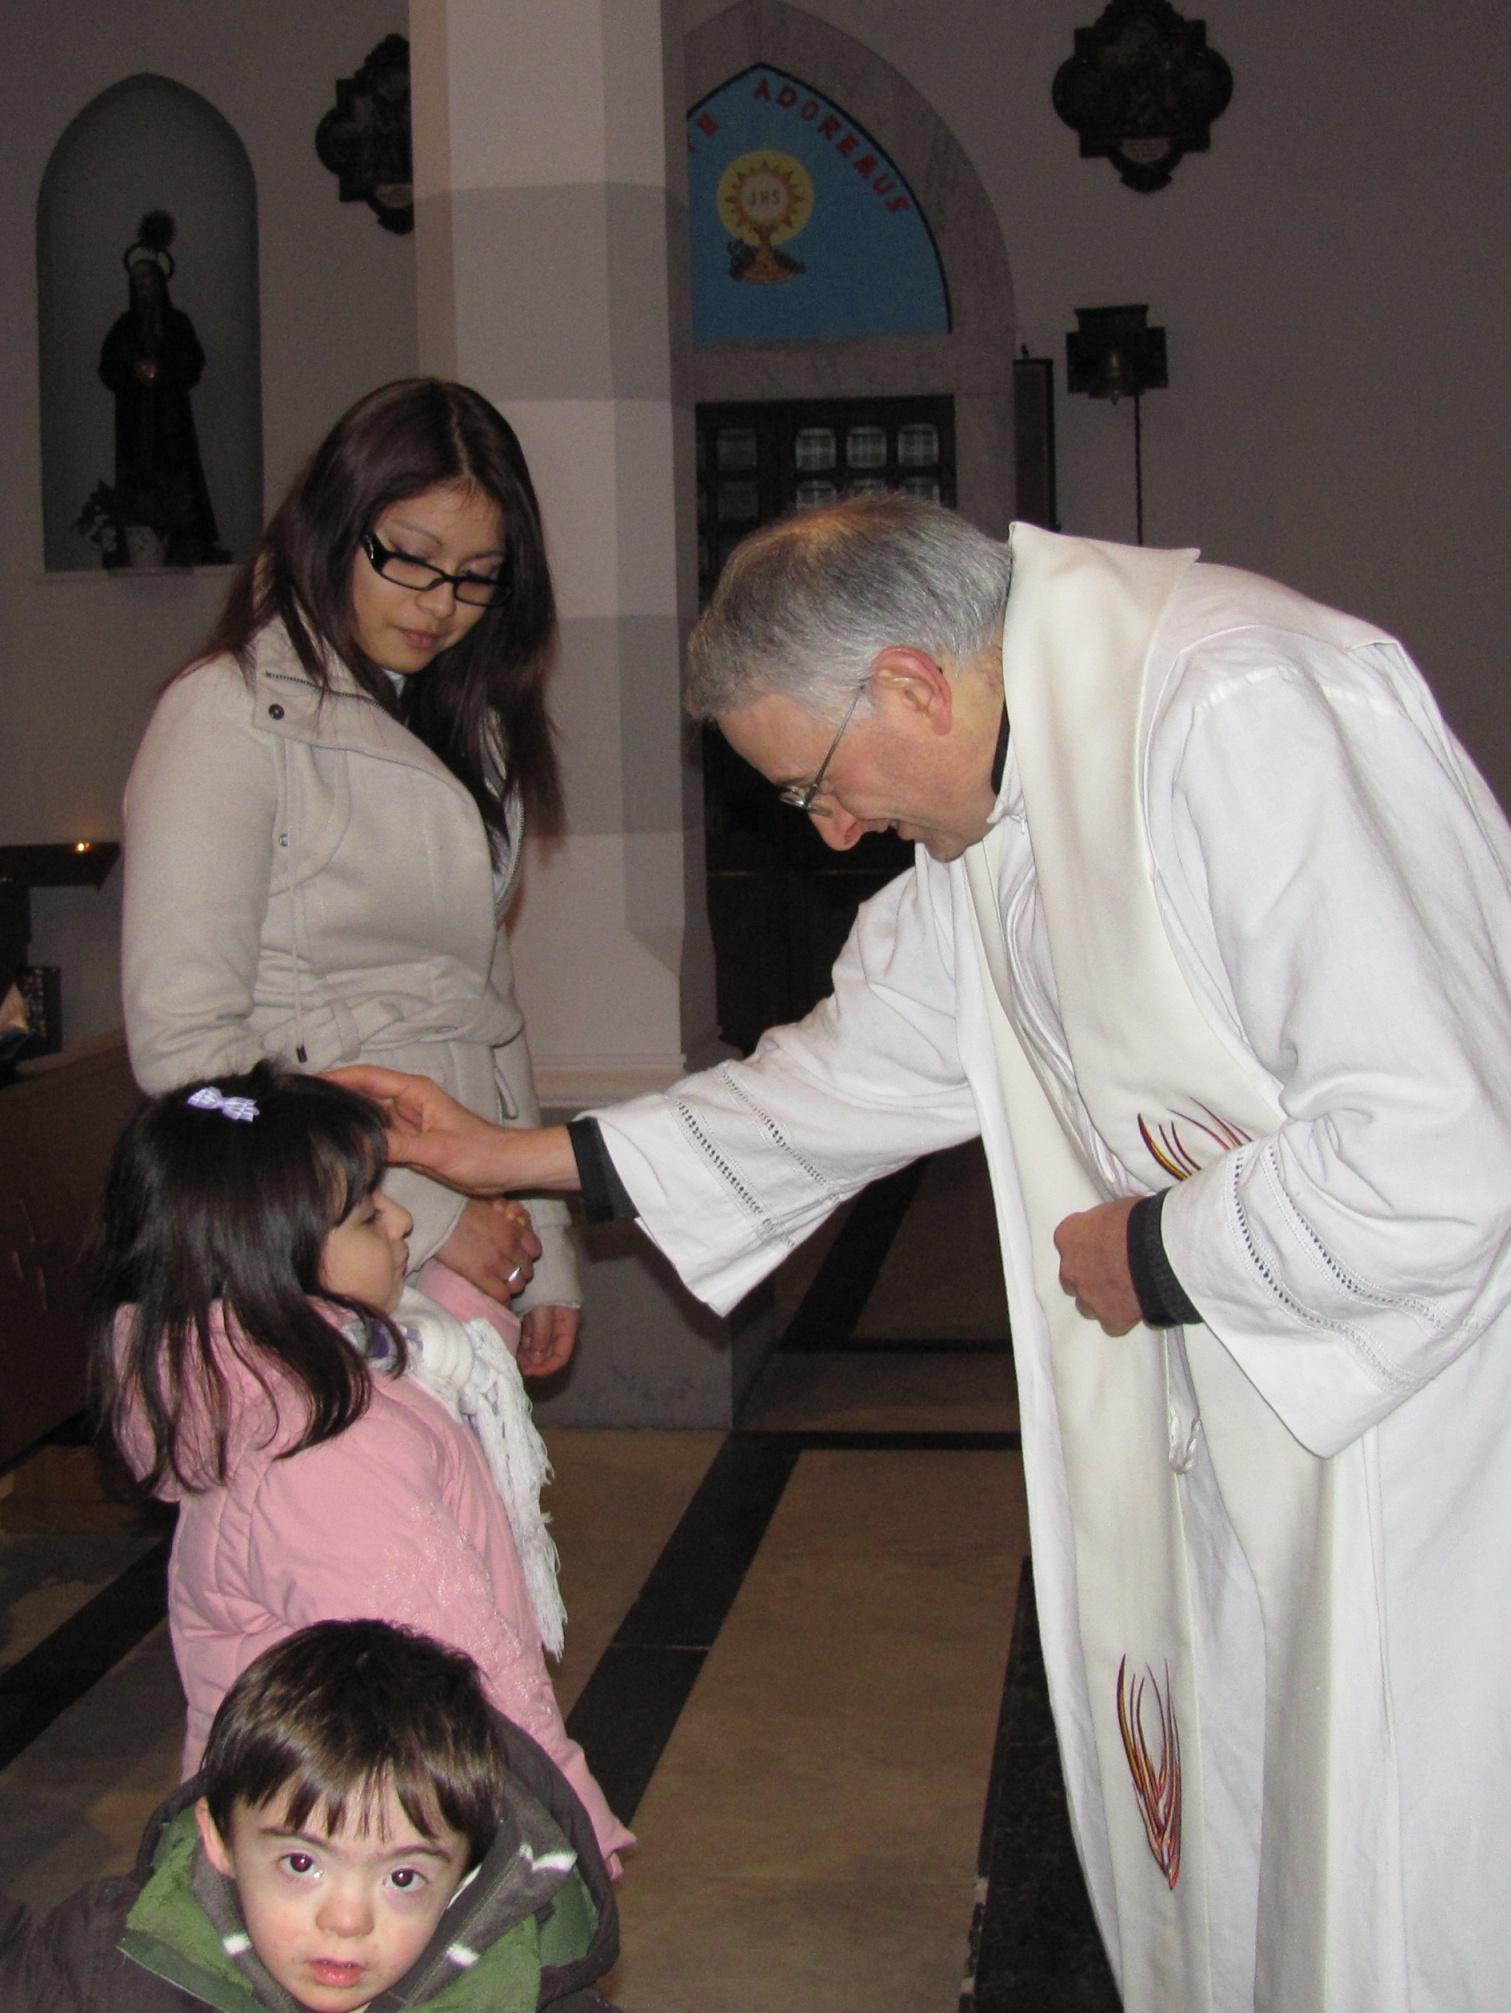 ricordo_battesimo_gesu_2011-01-23-16-28-49